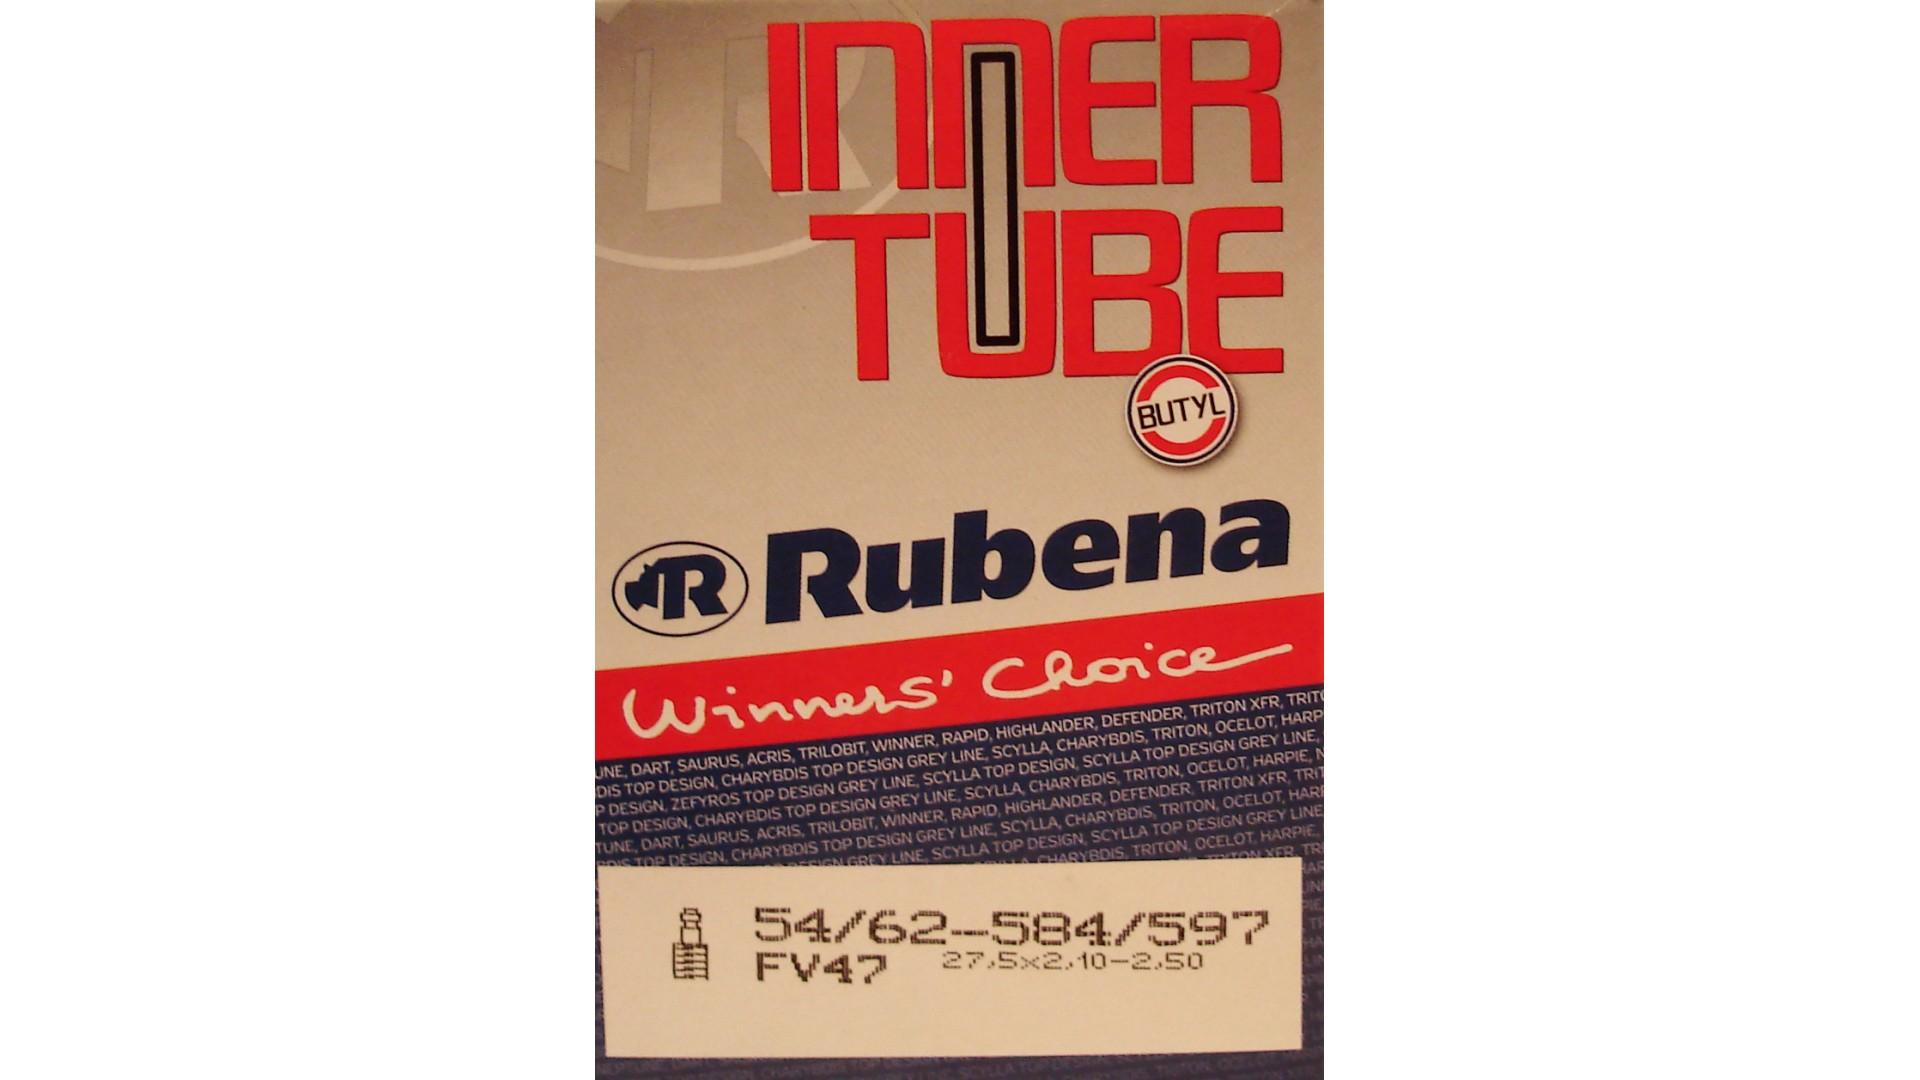 Камера RUBENA 27,5 x 2,10 - 2,50 FV47 C08